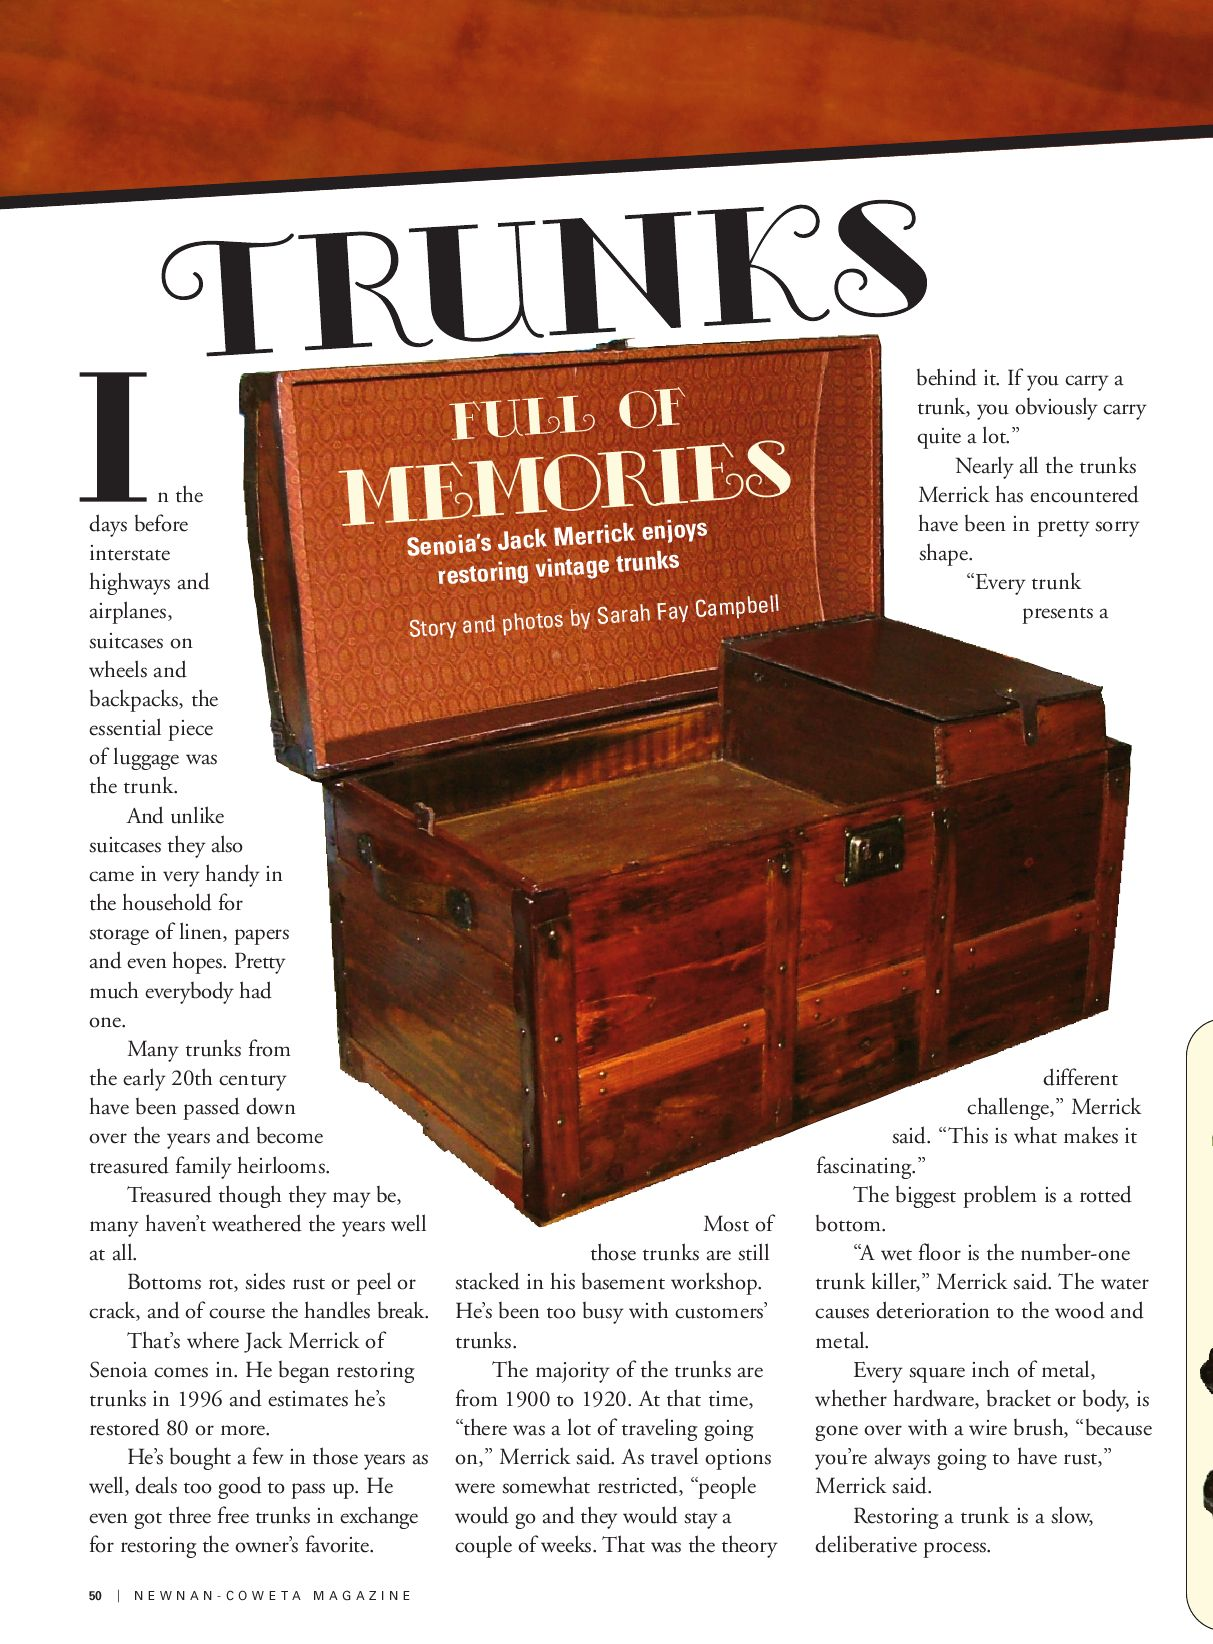 Newnan-Coweta Magazine, Nov/Dec 2009